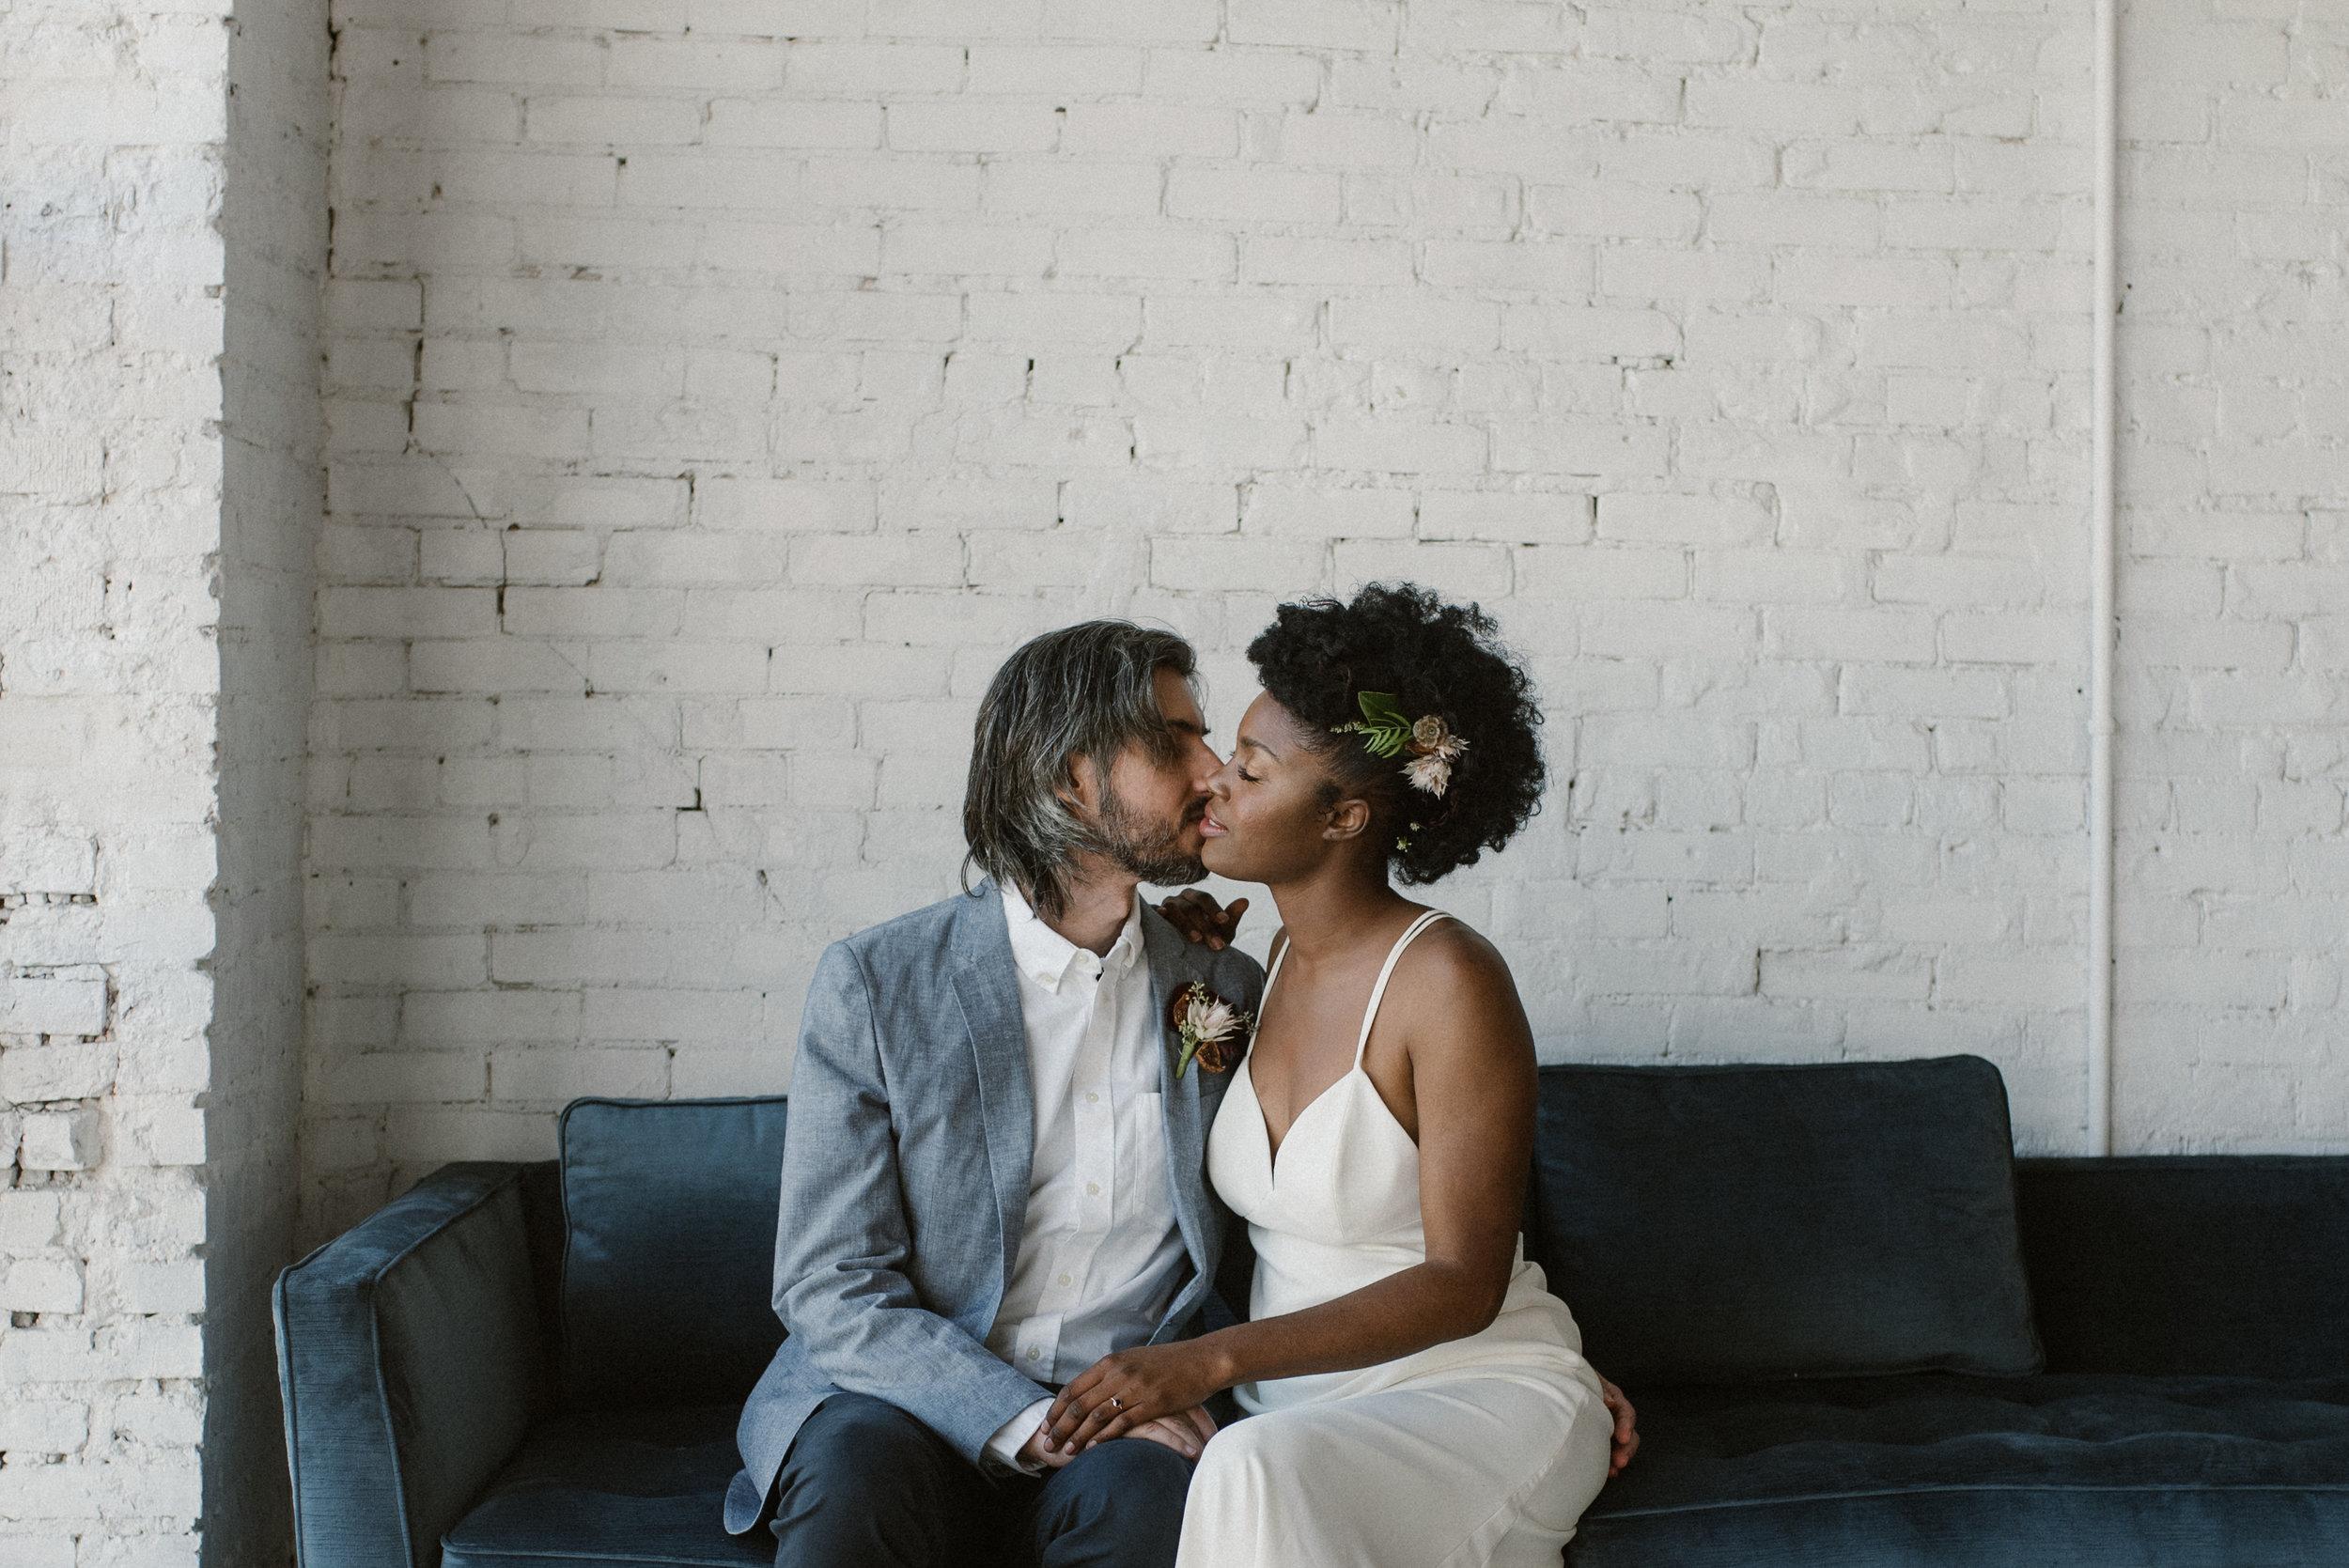 haus-820-minimal-editorial-wedding-styled-shoot-10.jpg